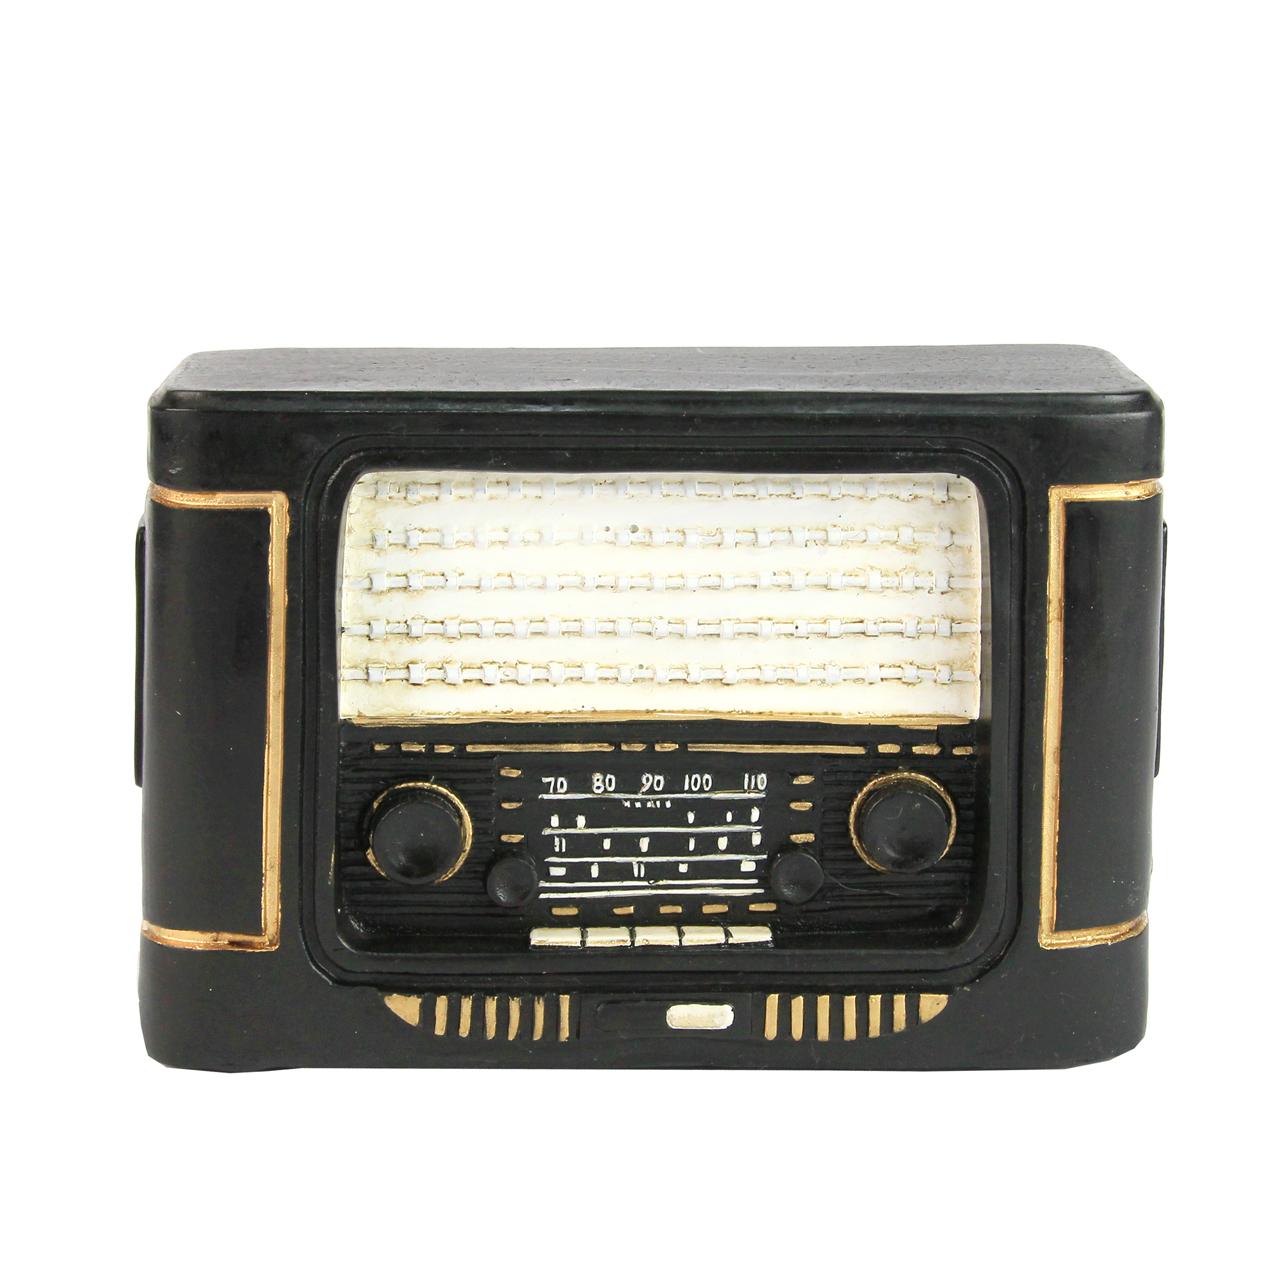 Pusculita Radio Neagra Cu Alb 16x6x11 Cm